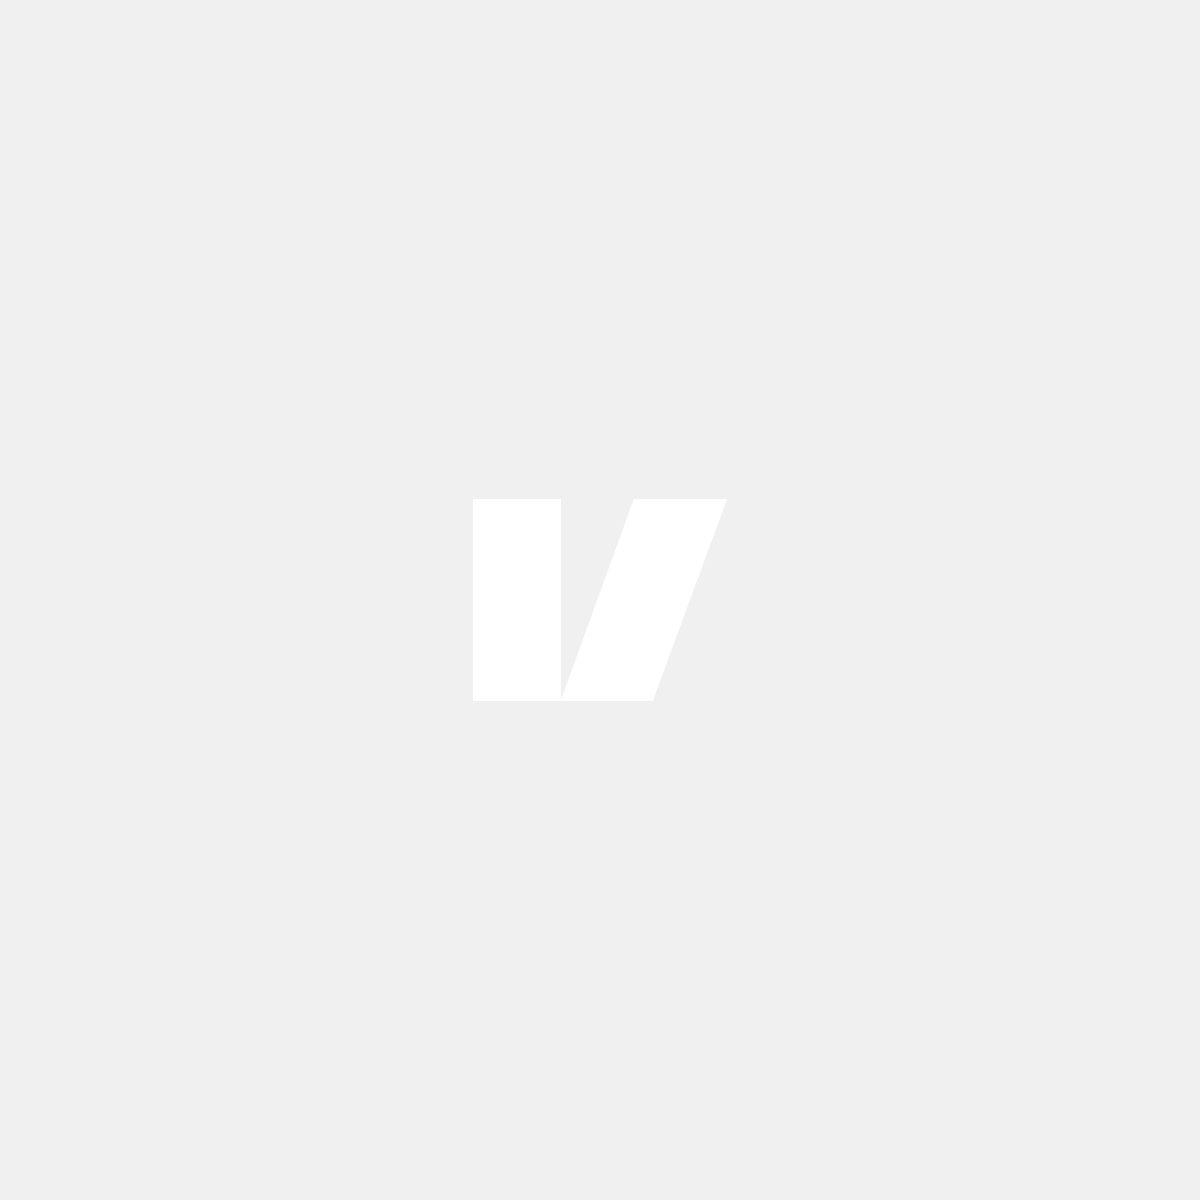 Iridium Takvinge till Volvo S60